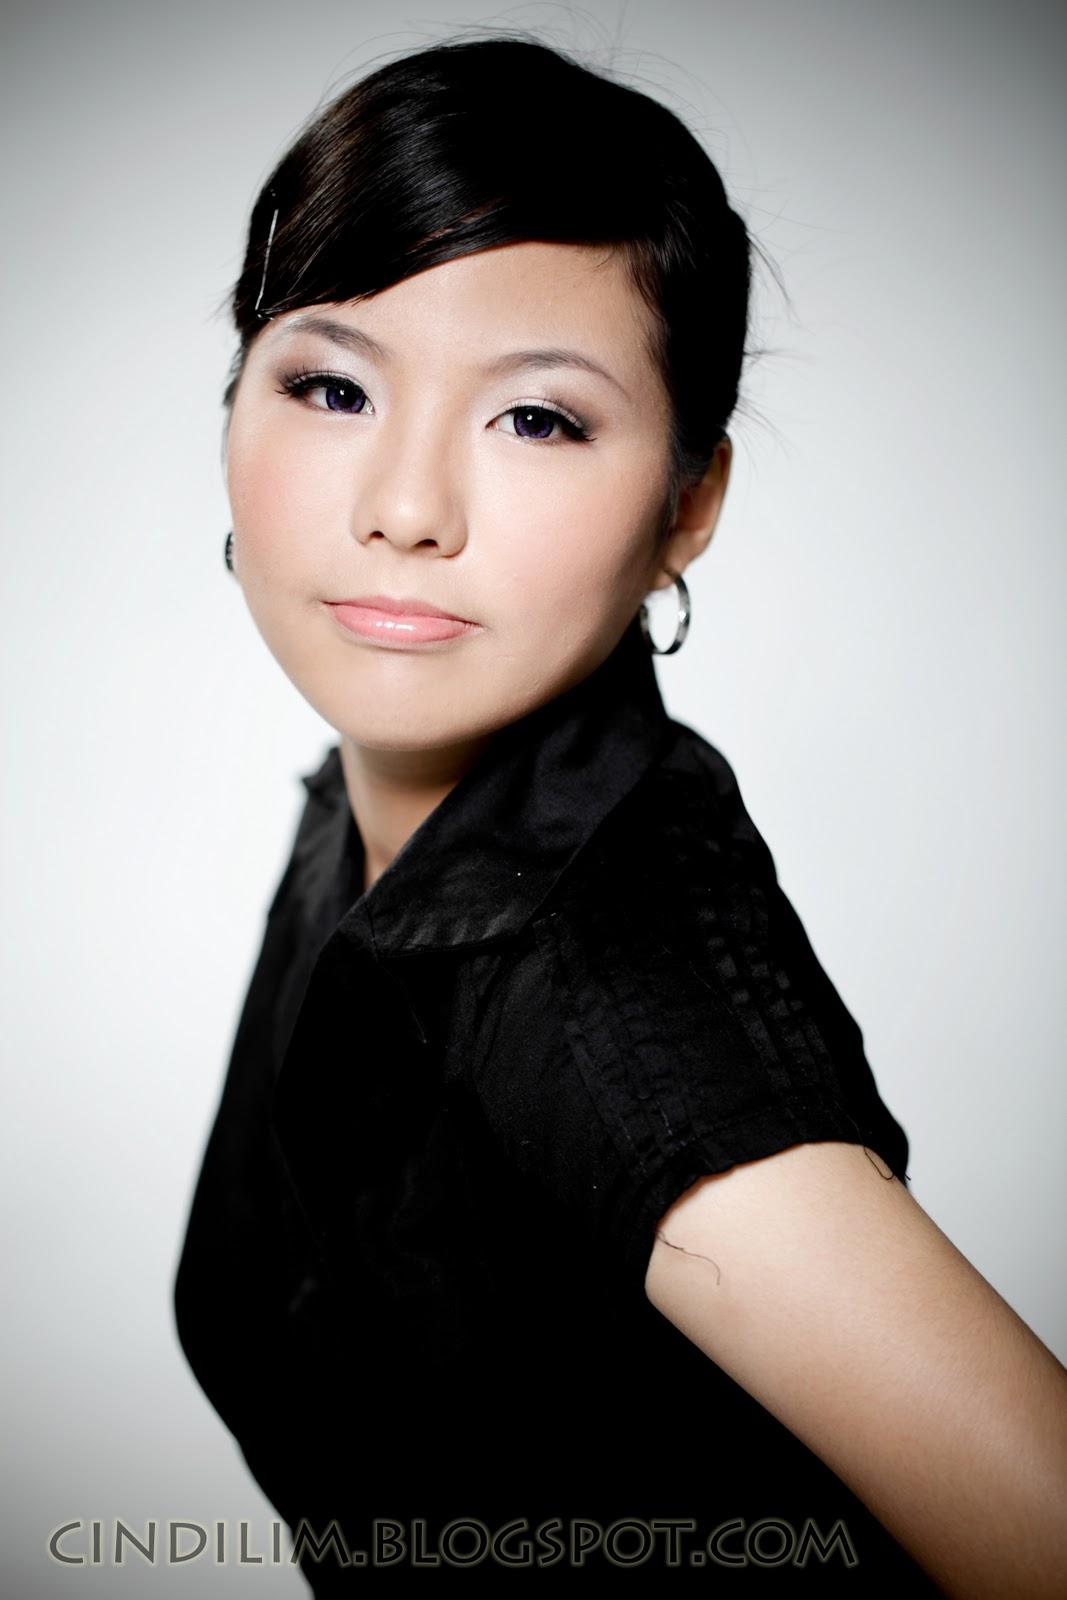 Cindi Pro Makeup Artist Commercial Photoshoot Makeup: :: Cindi Pro. Makeup Artist ::: Hsuan Yang